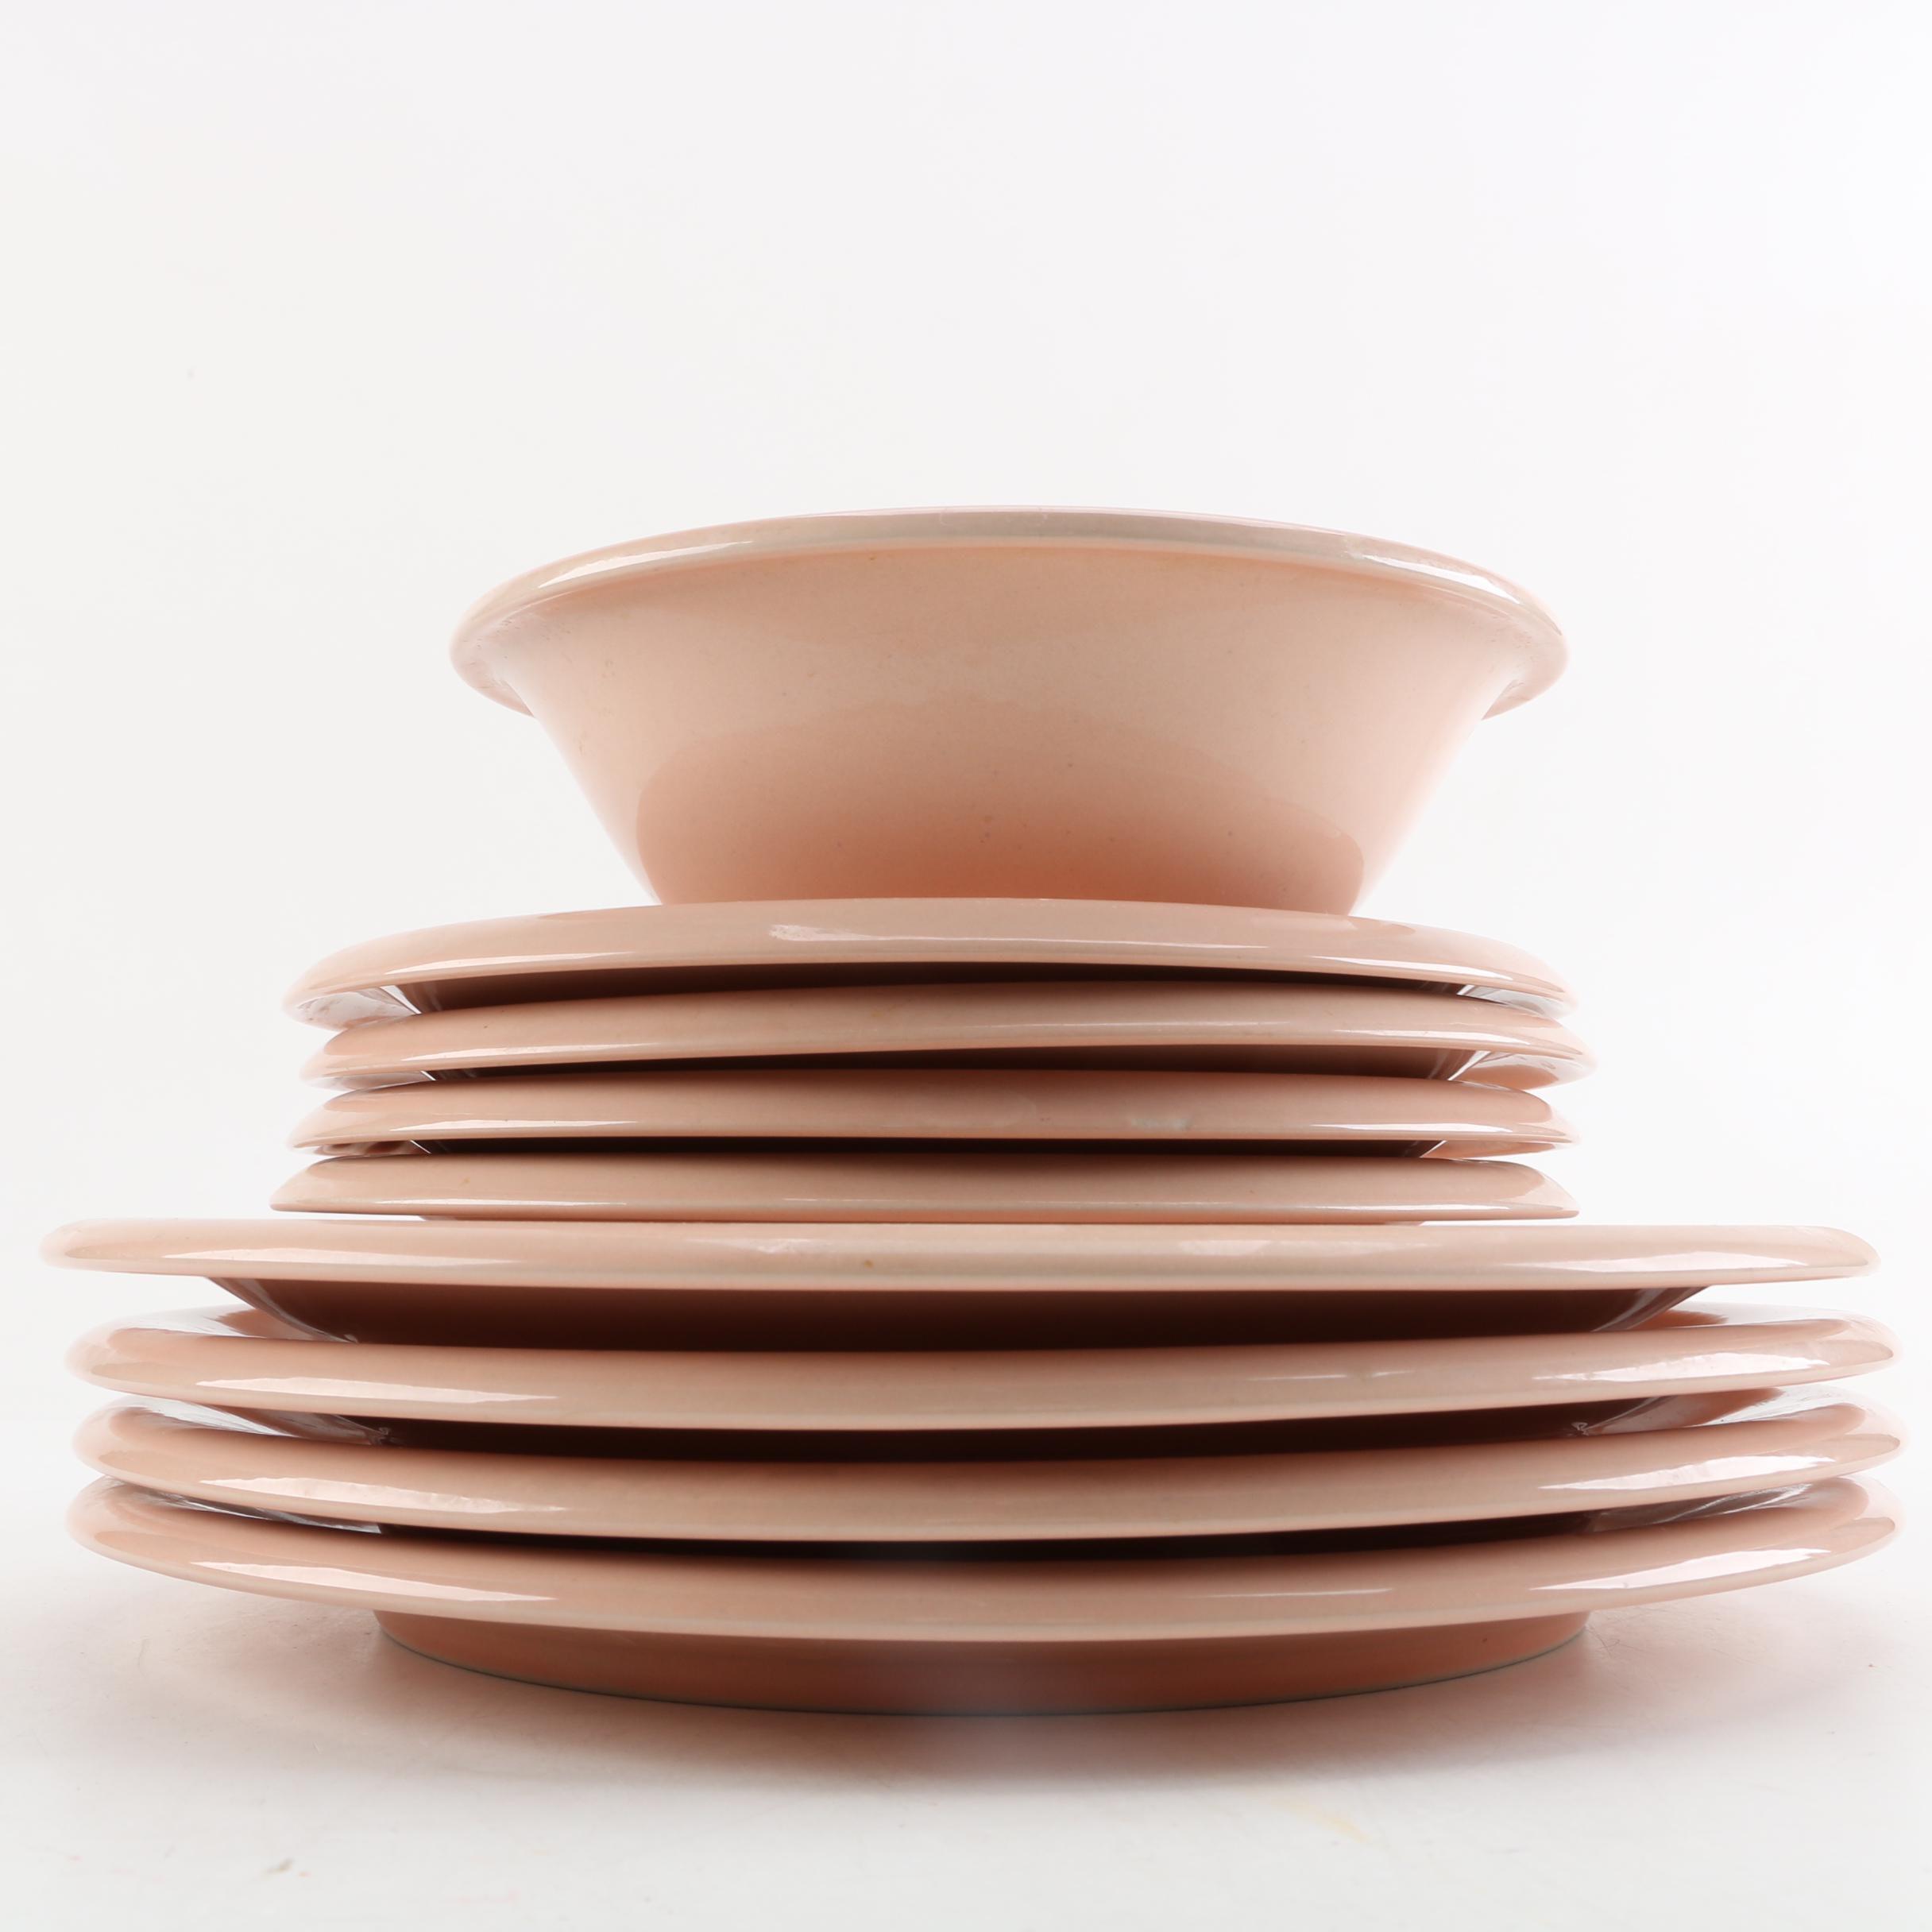 Baker, Hart & Stuart Peach Tableware